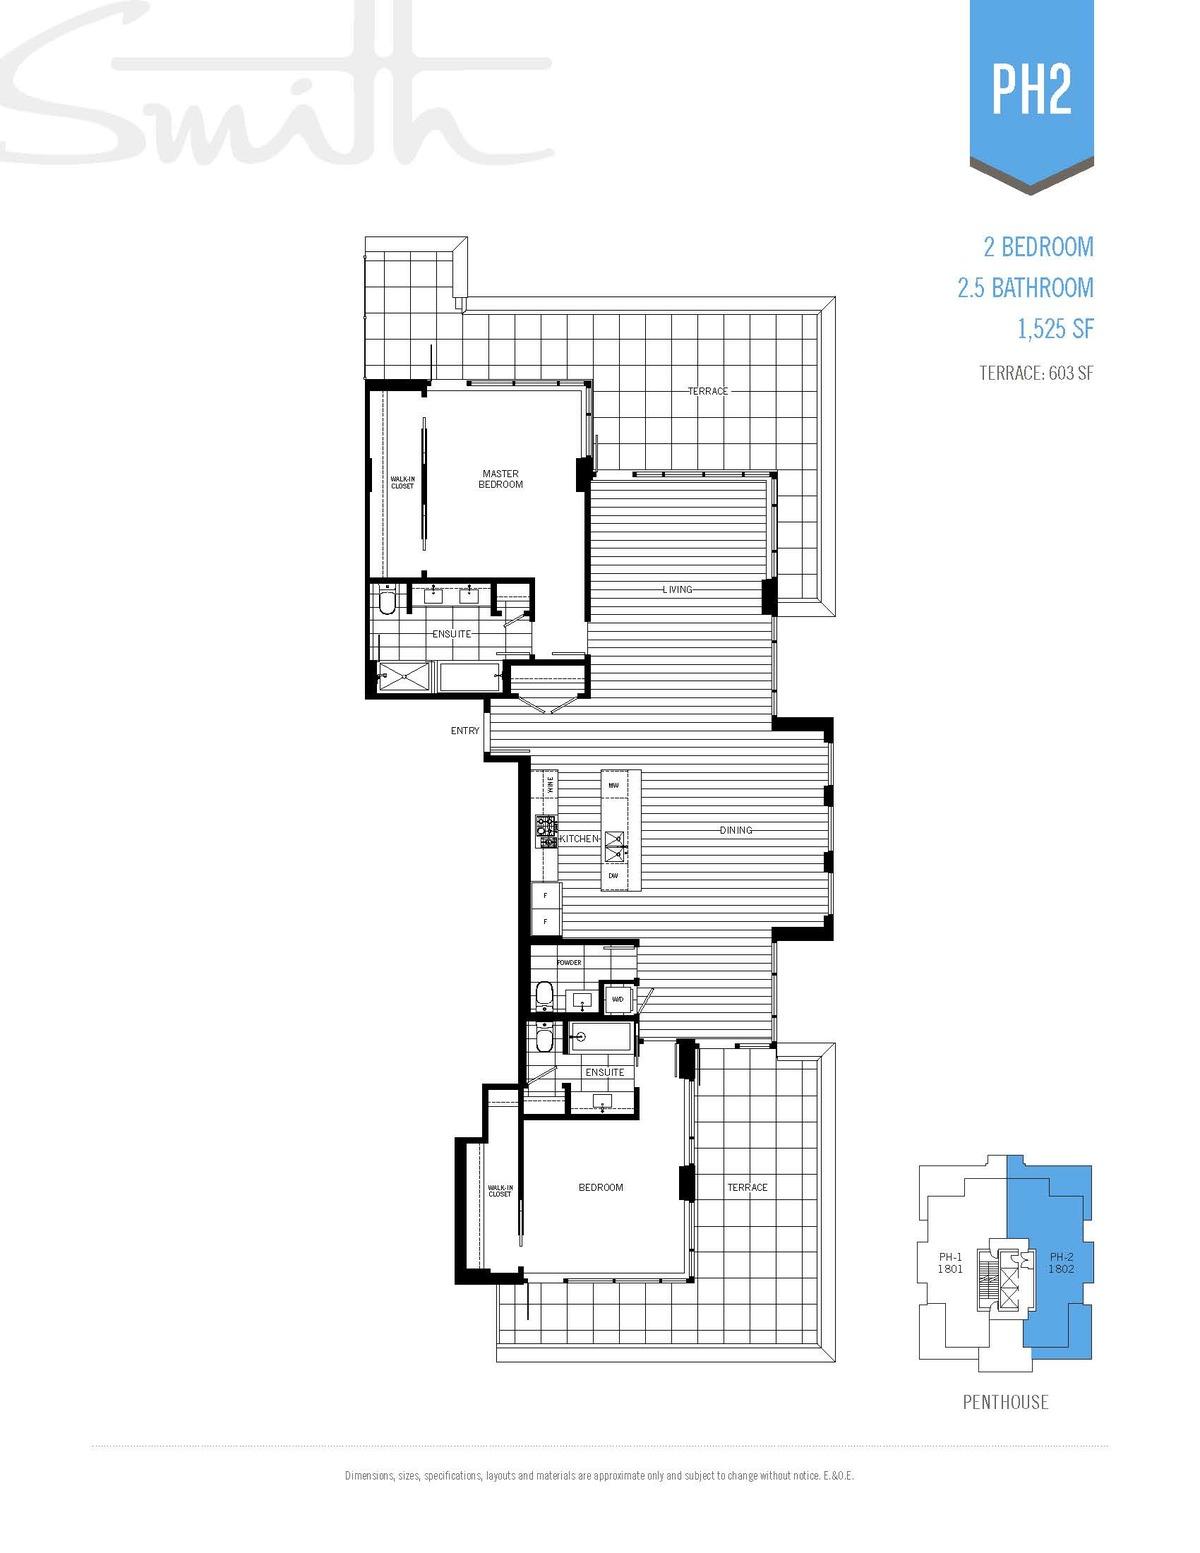 Smith Floorplan PH2